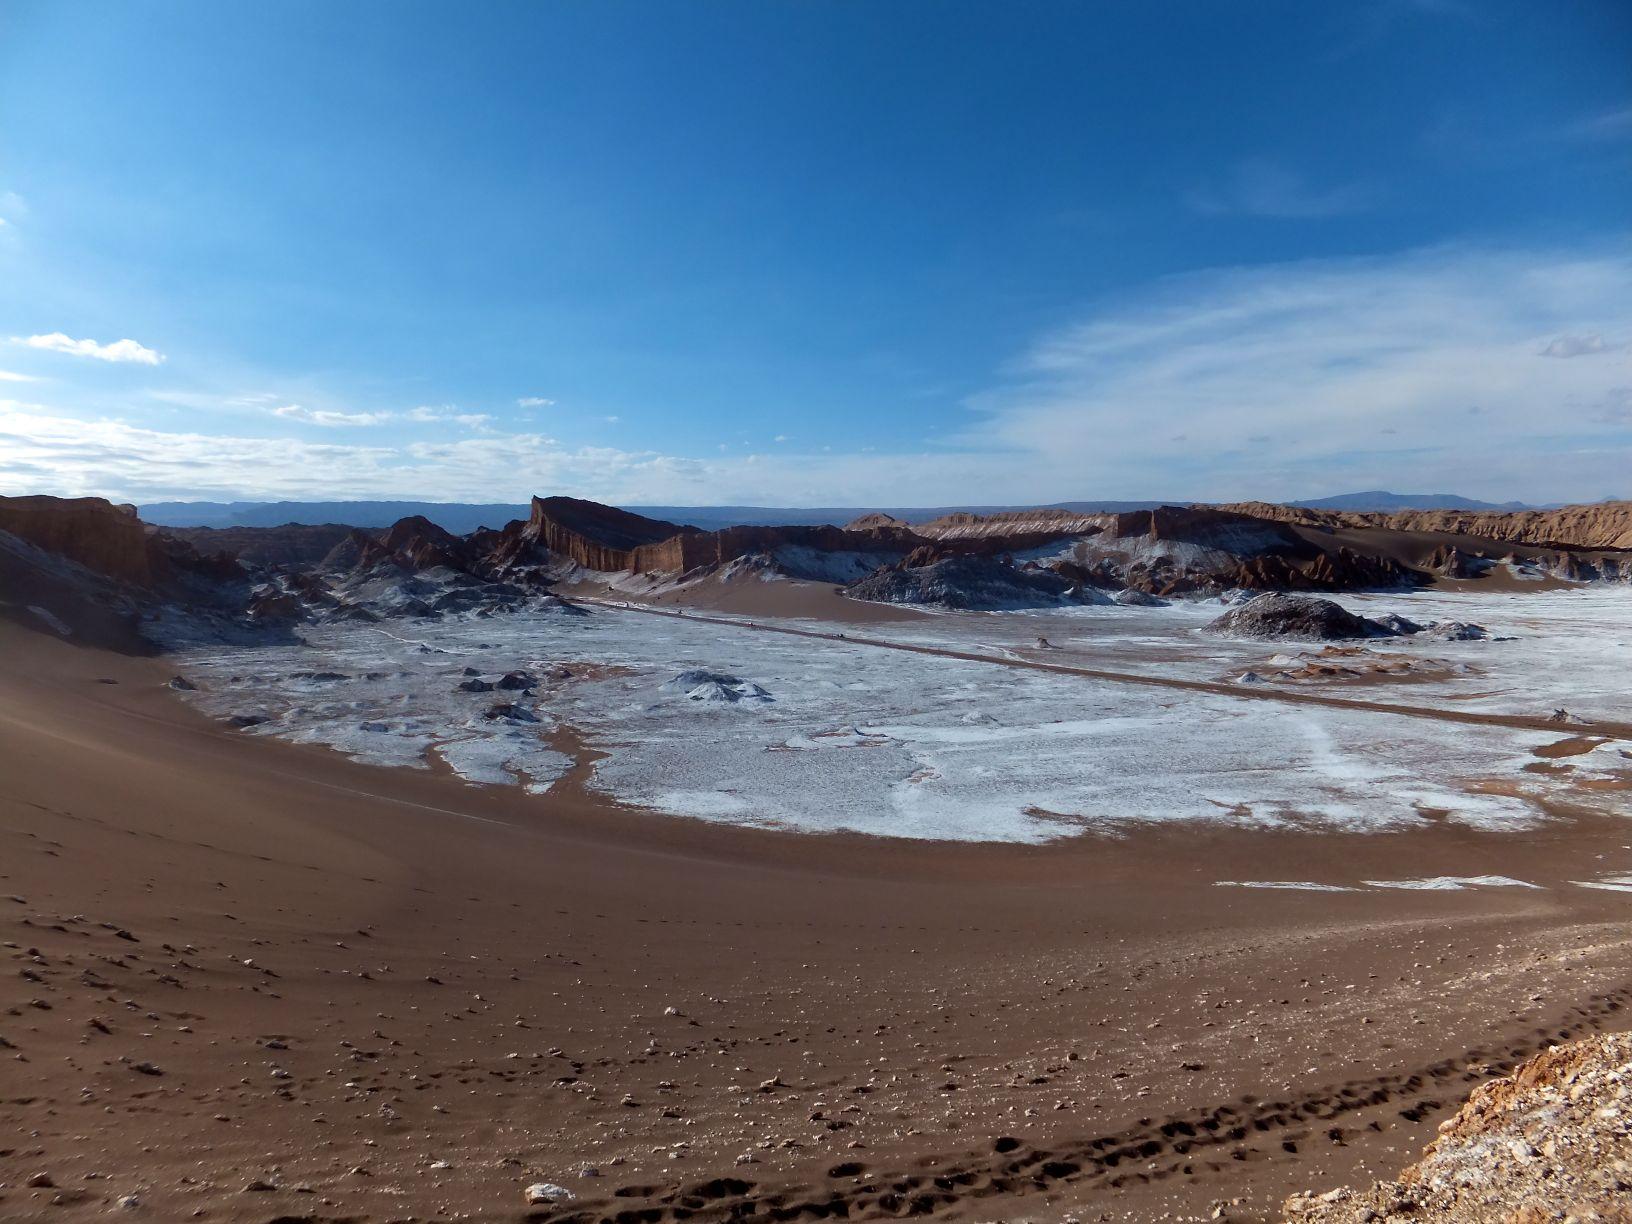 Endstation Chile: San Pedro de Atacama – oder wer fährt schon Fahrrad in der Wüste?